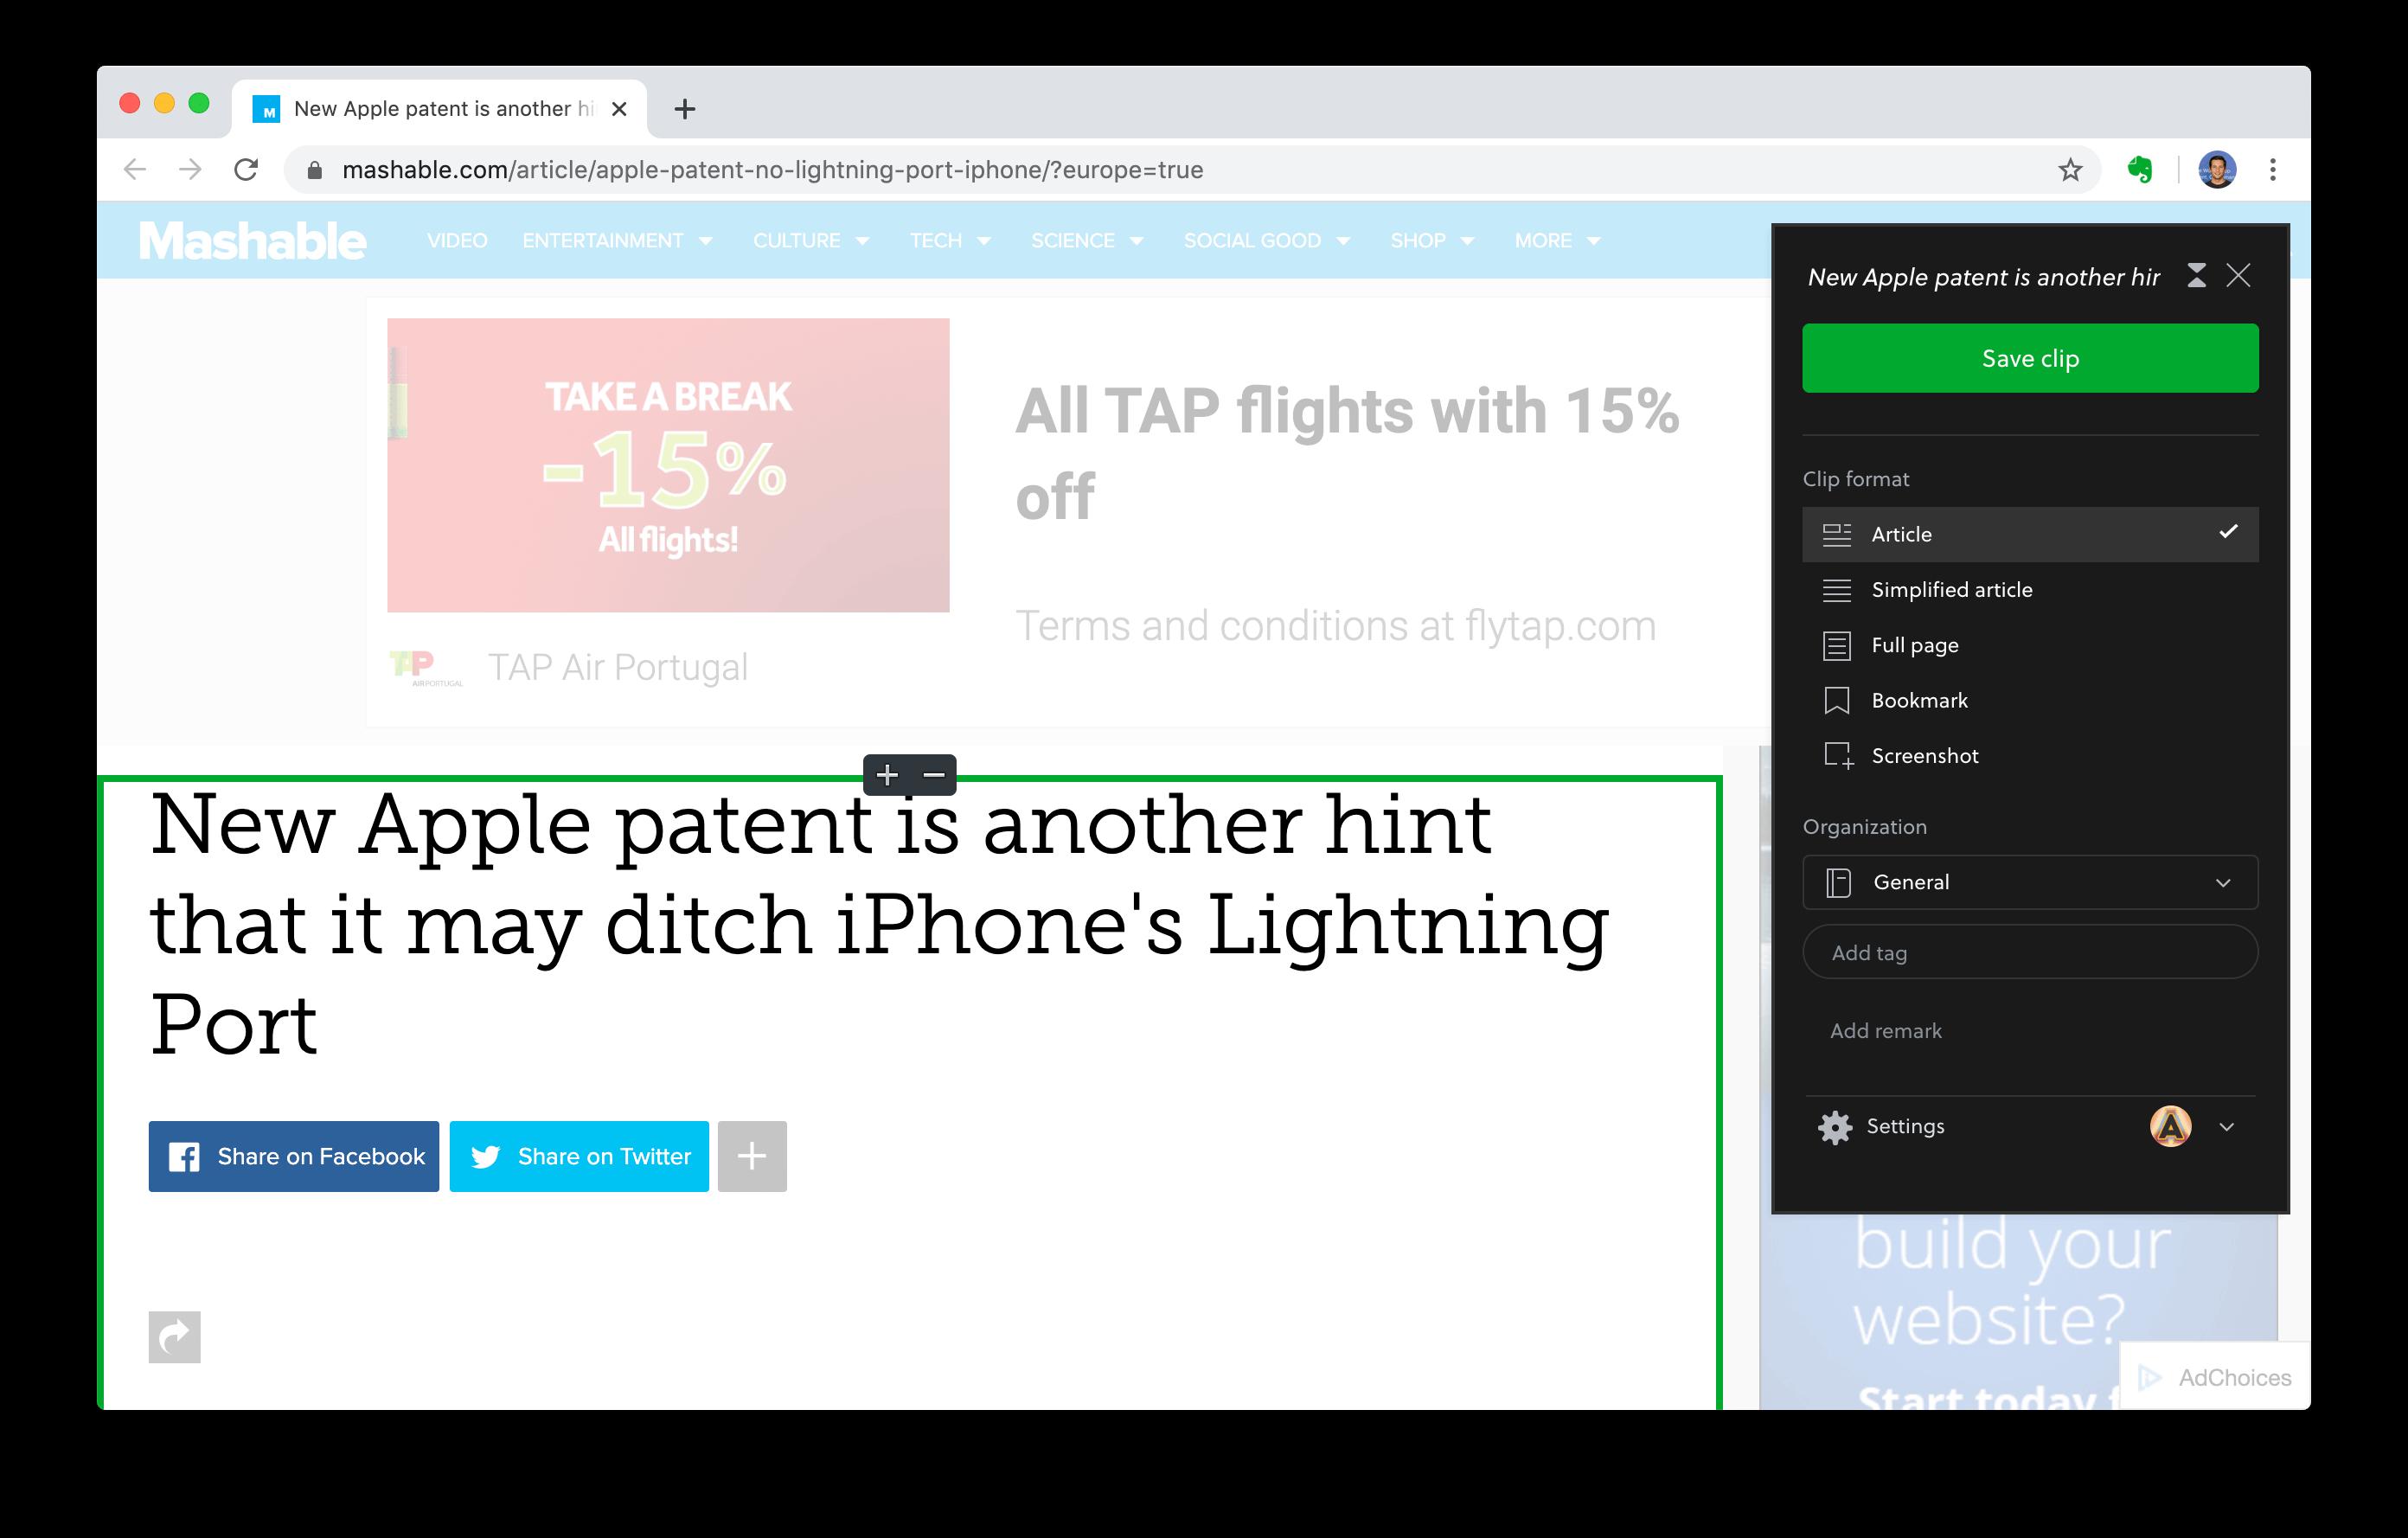 evernote web clipper chrome extension